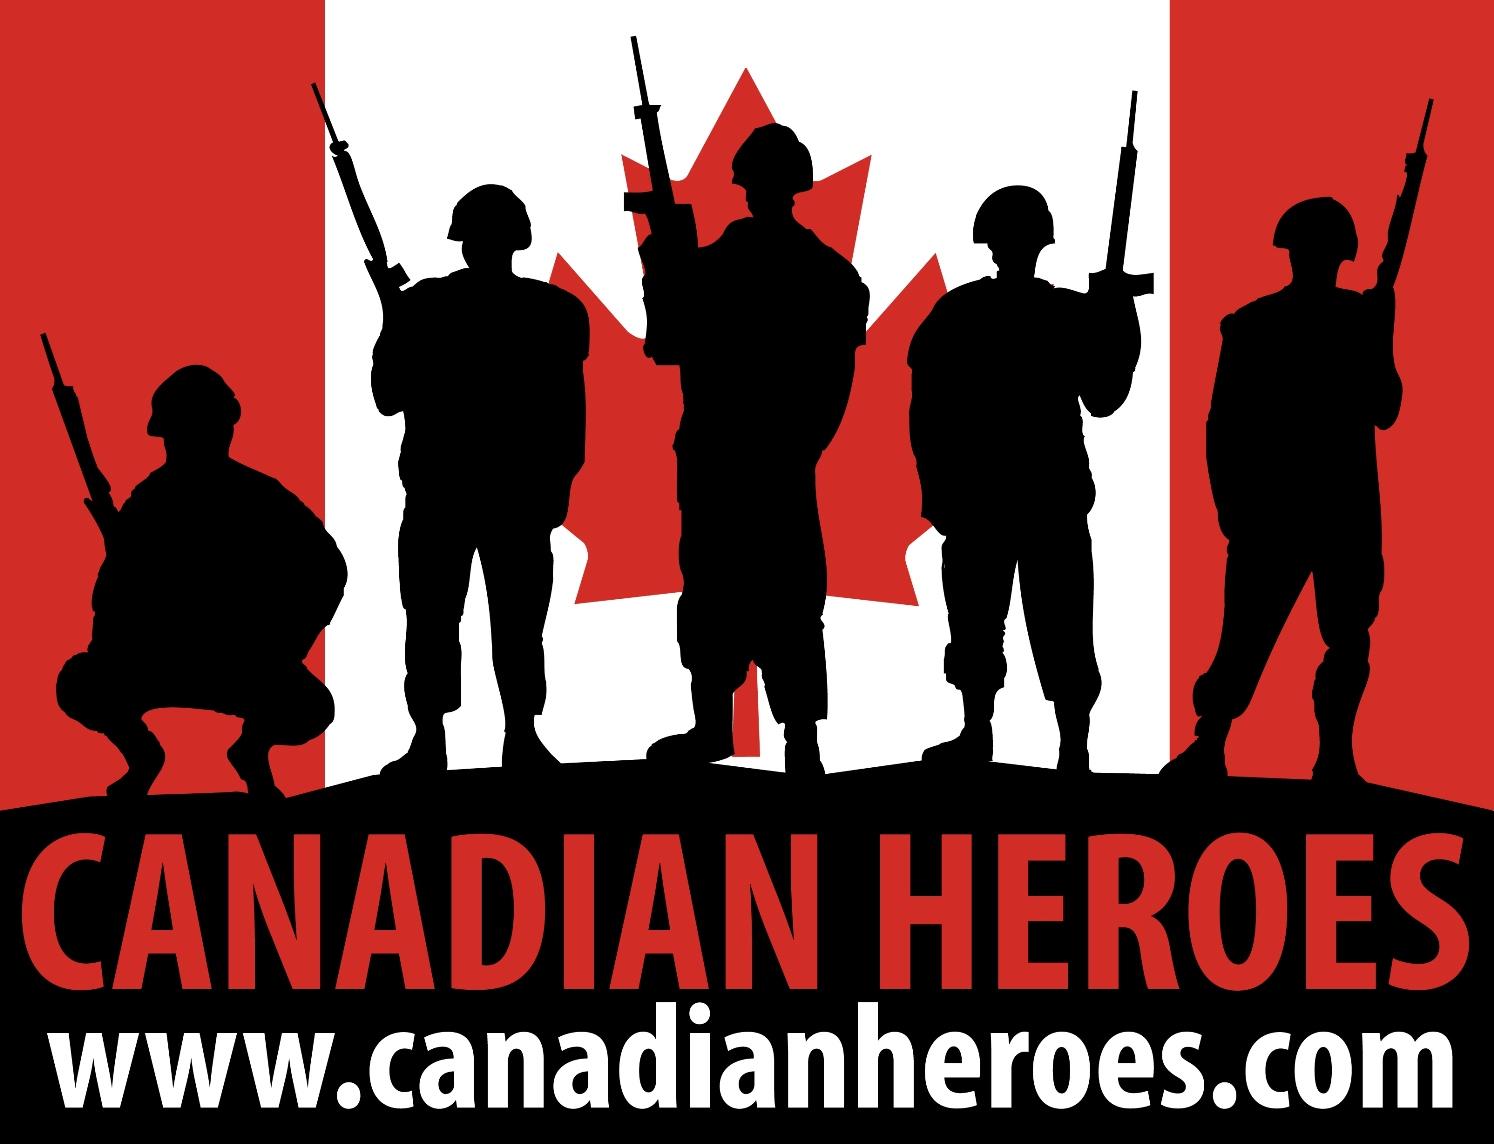 Canadian Heroes Foundation logo